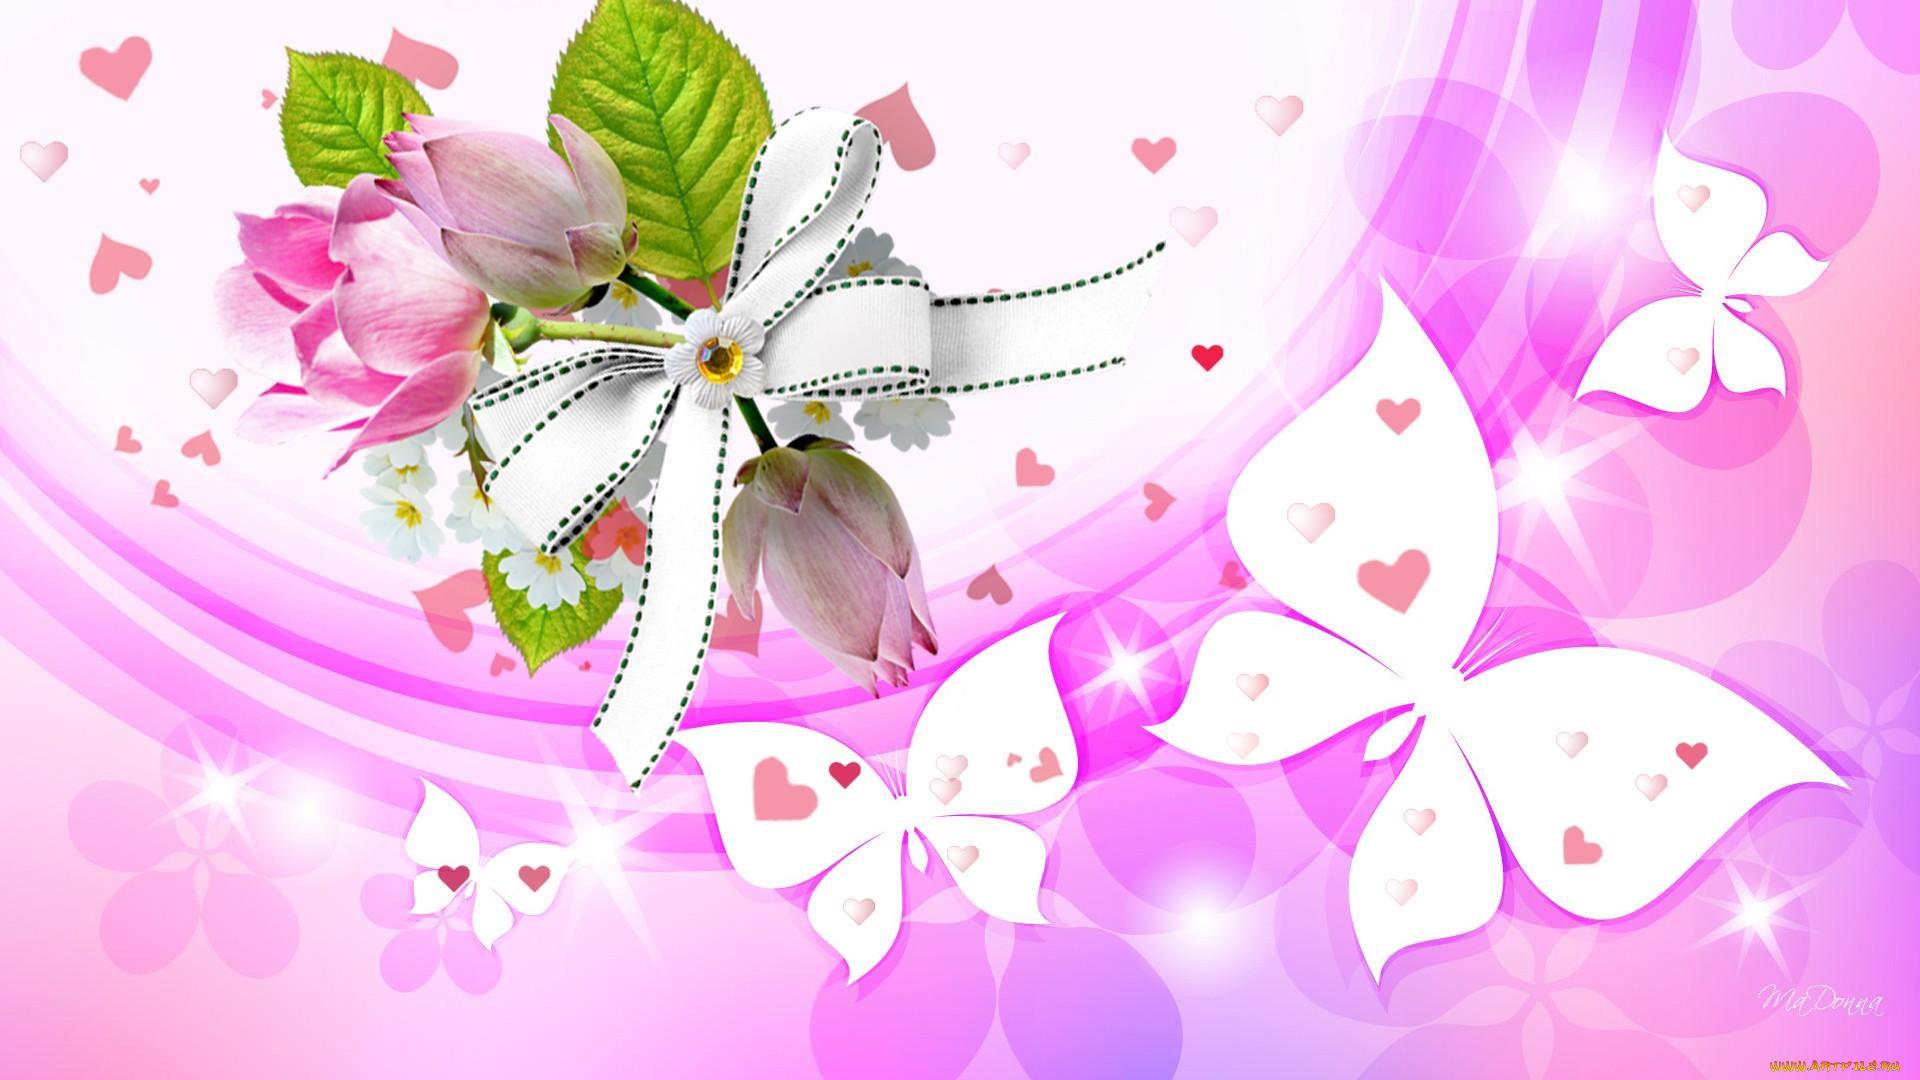 Именам днем, открытки с бантиками и цветами